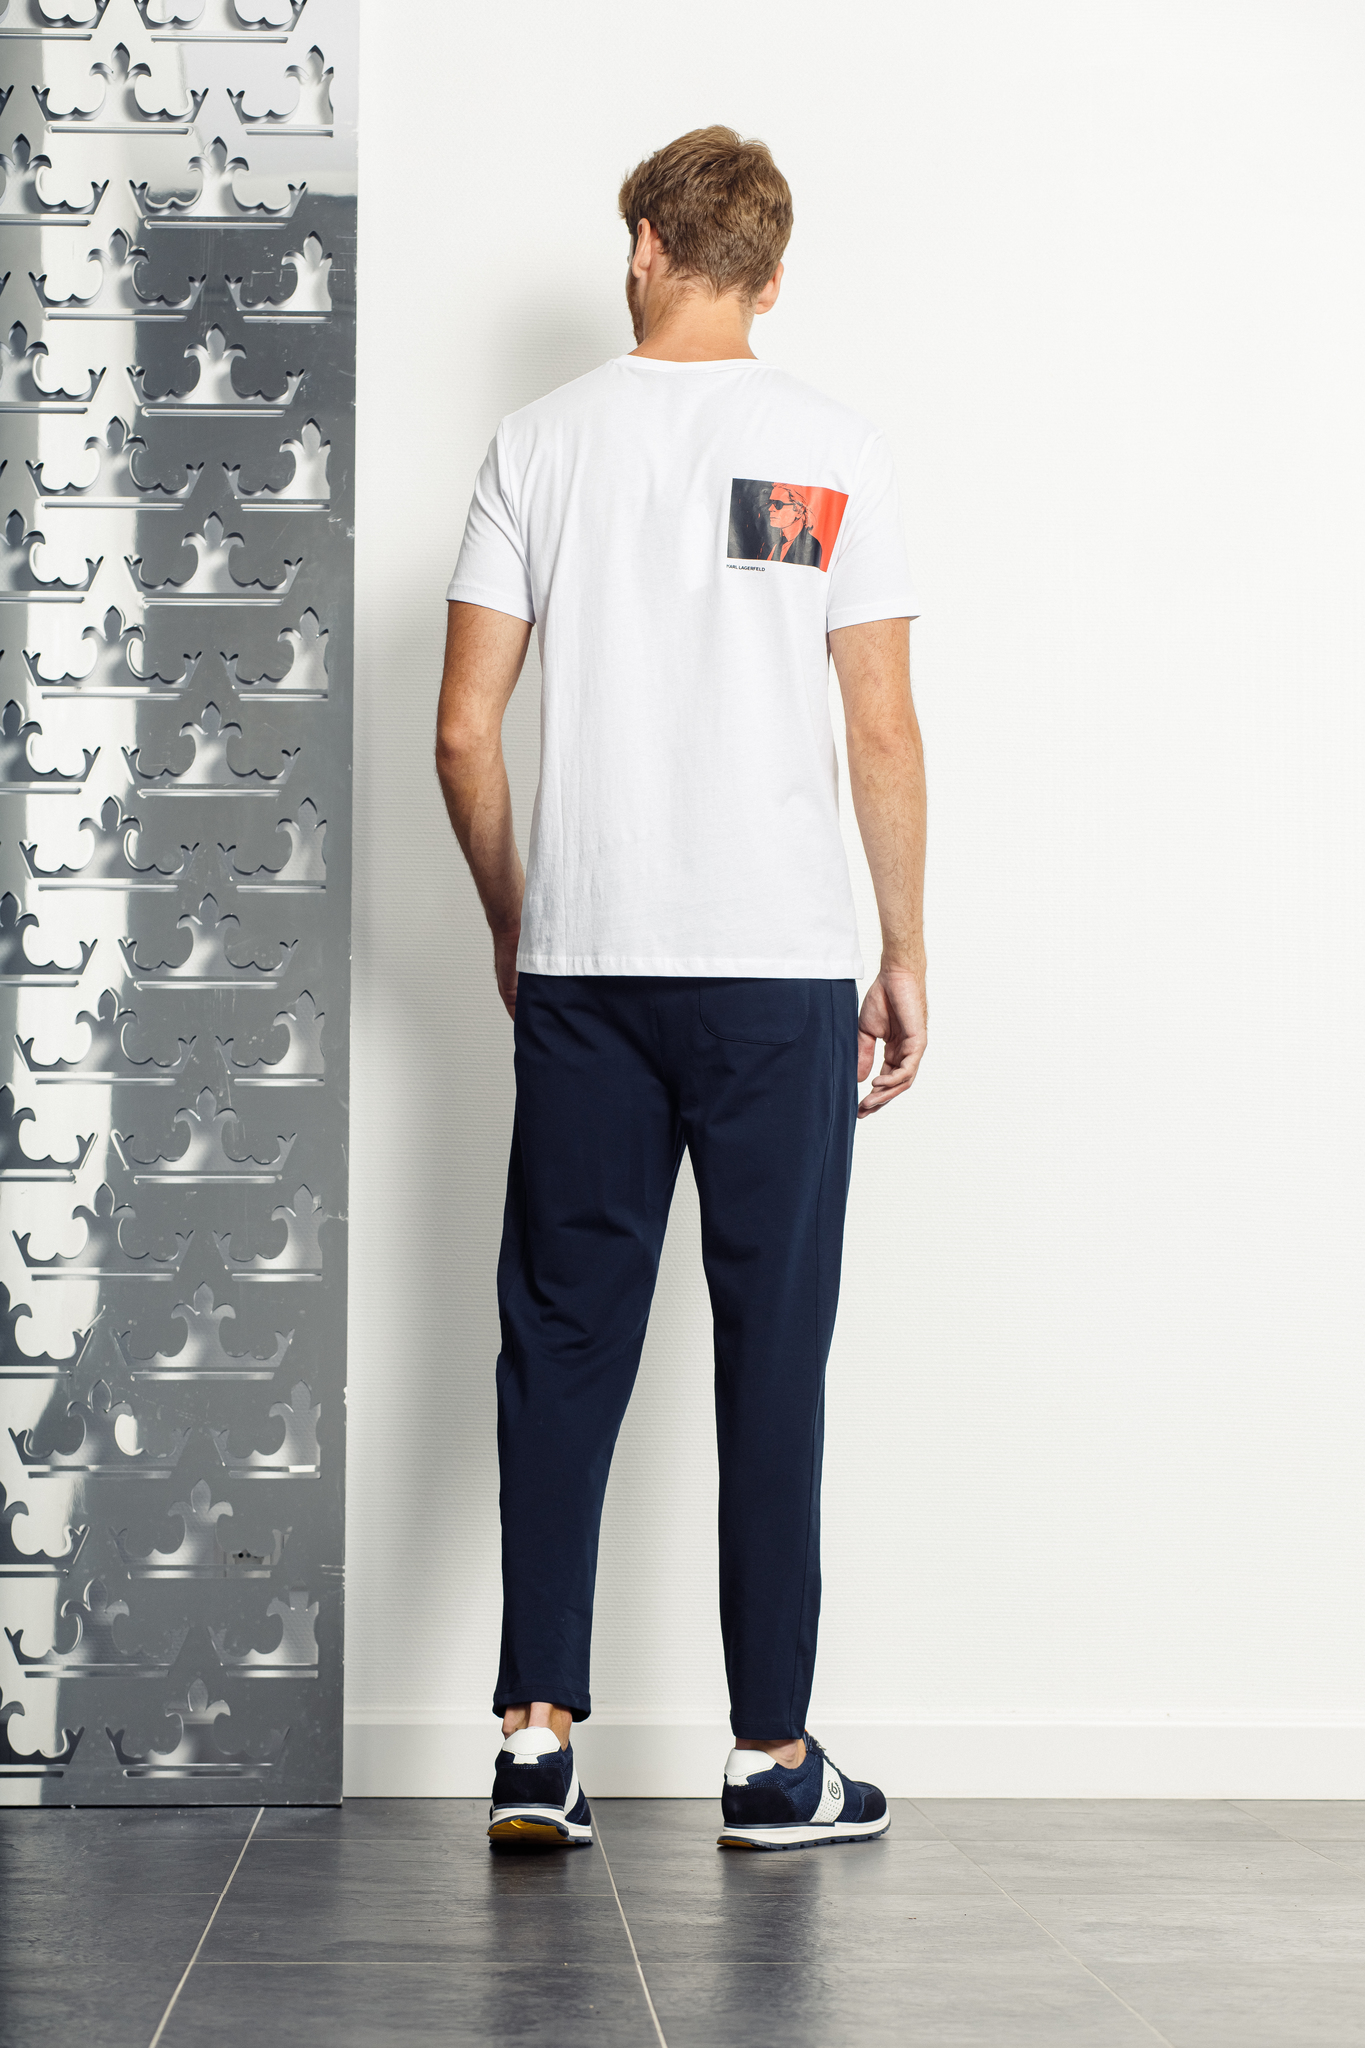 KARL Lagerfeld Футболка с надписью